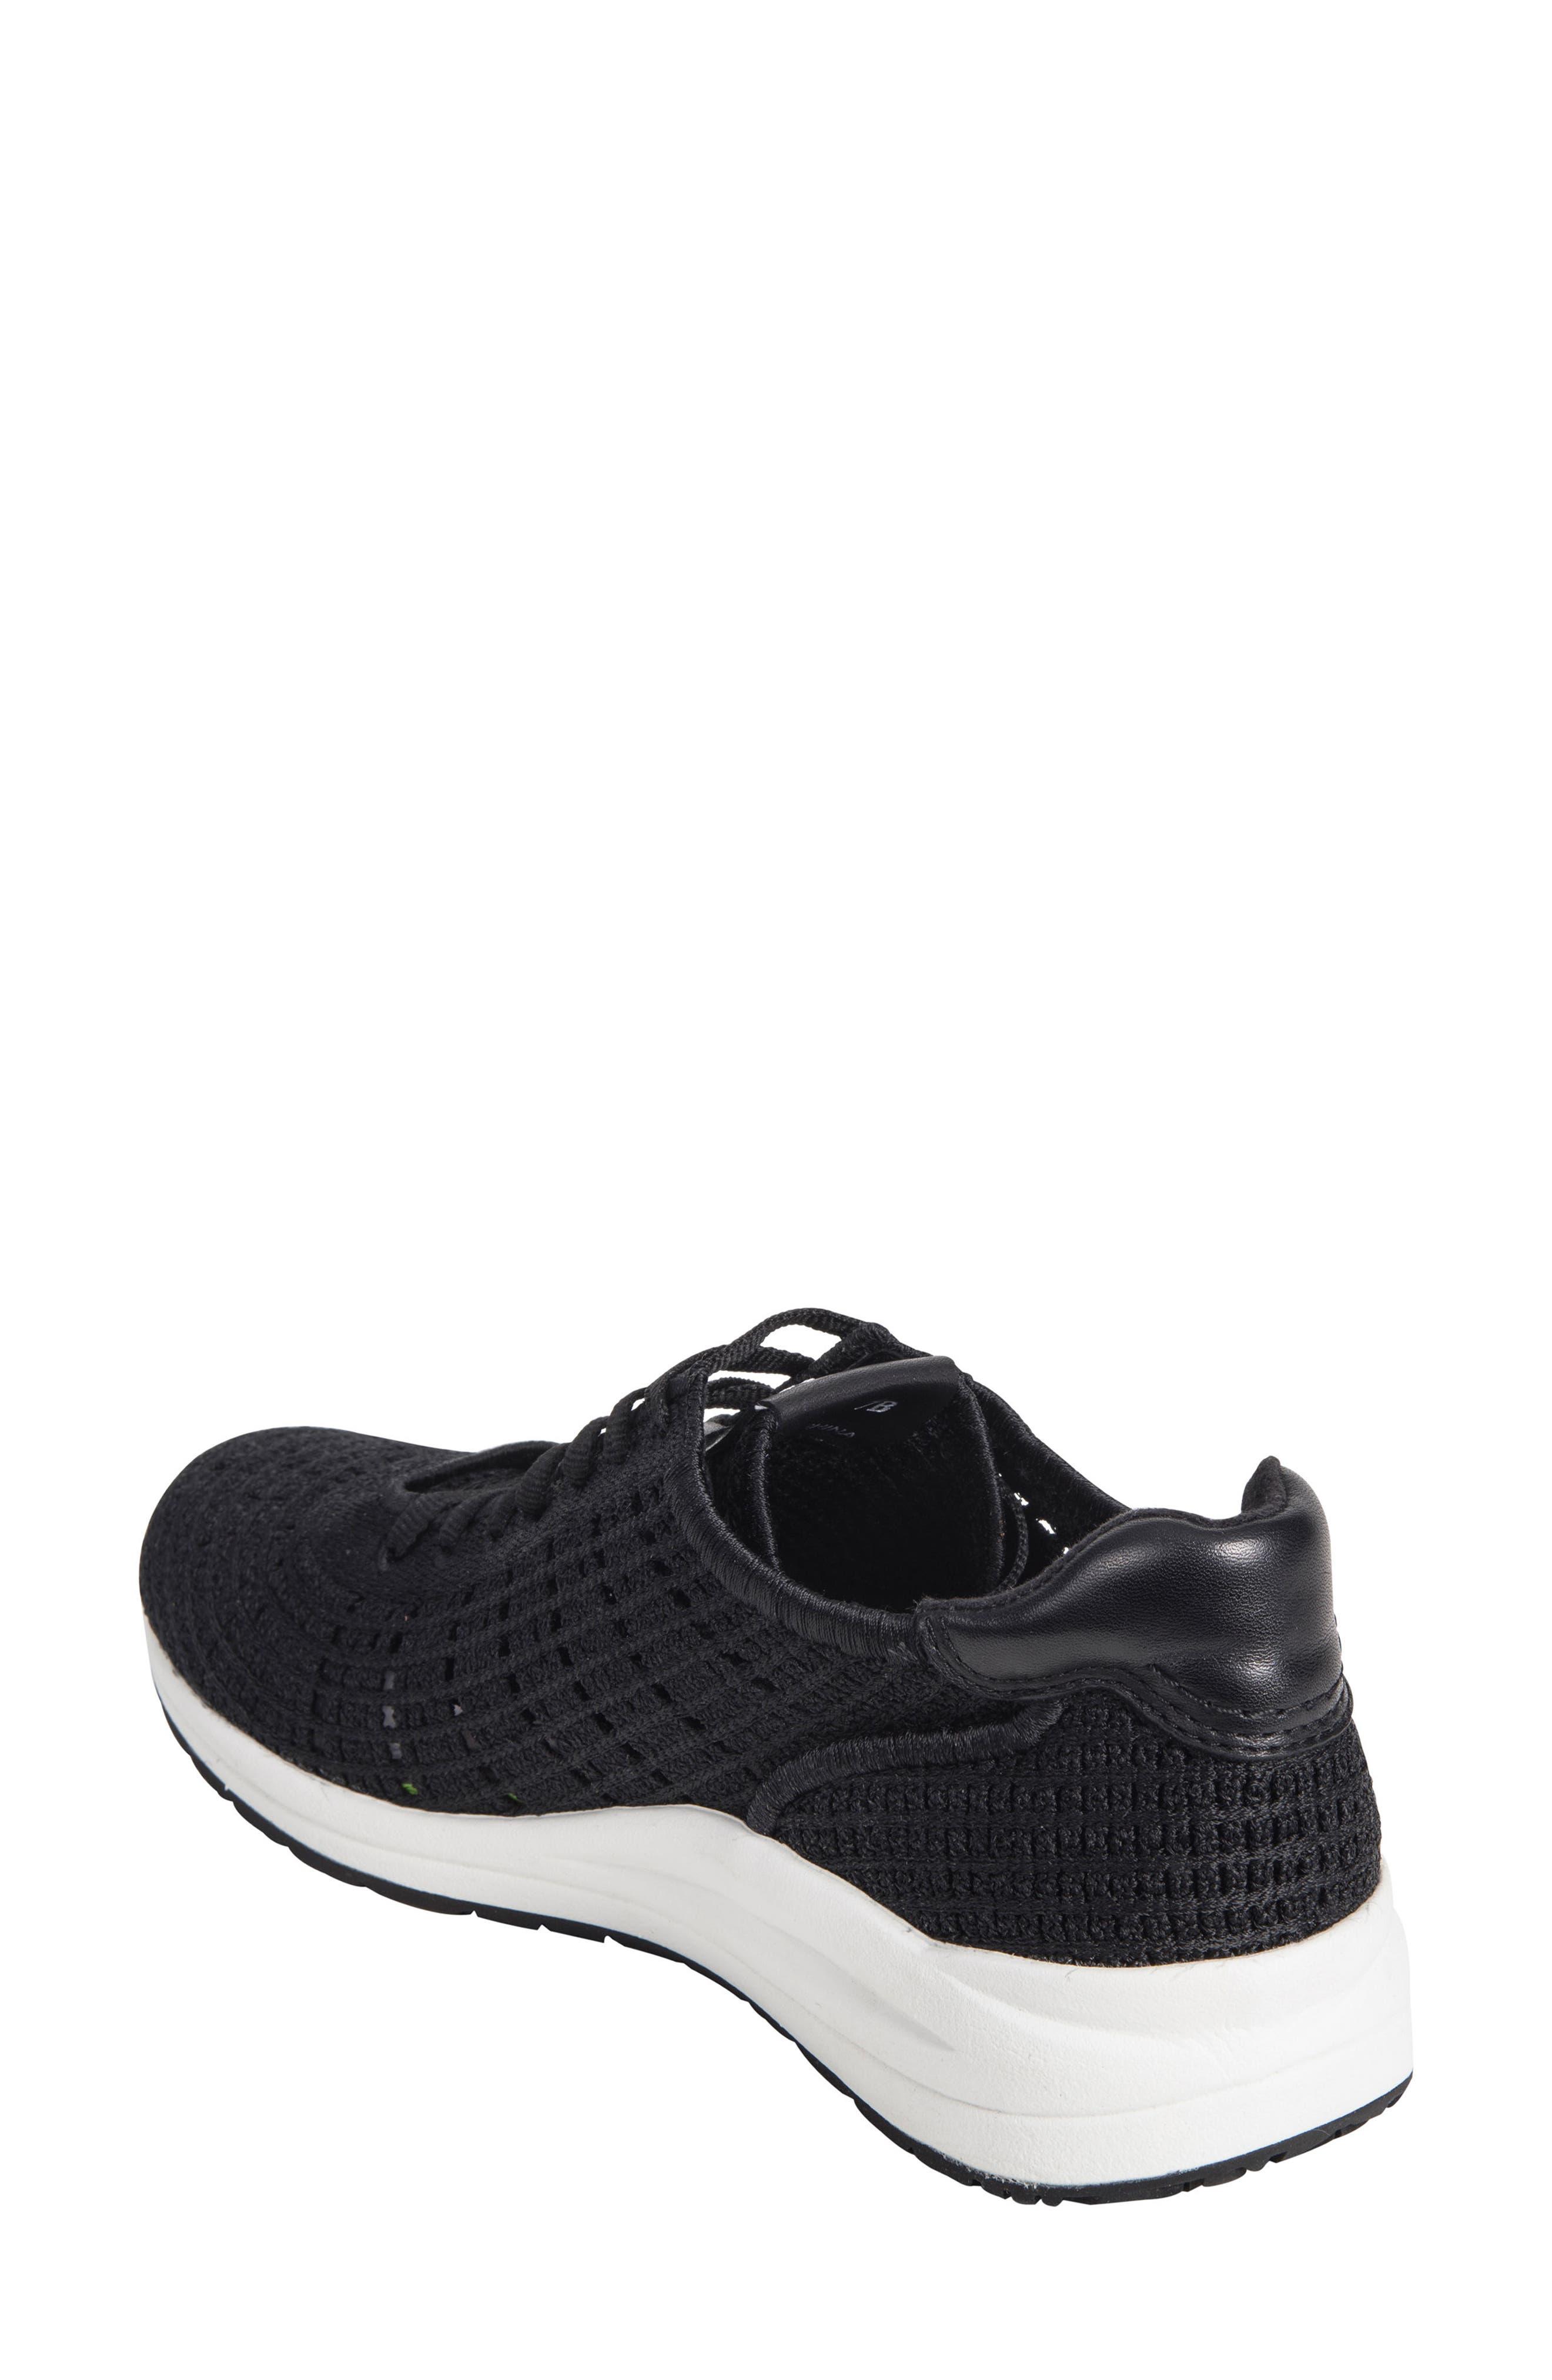 Earth Vital Sneaker,                             Alternate thumbnail 2, color,                             Black